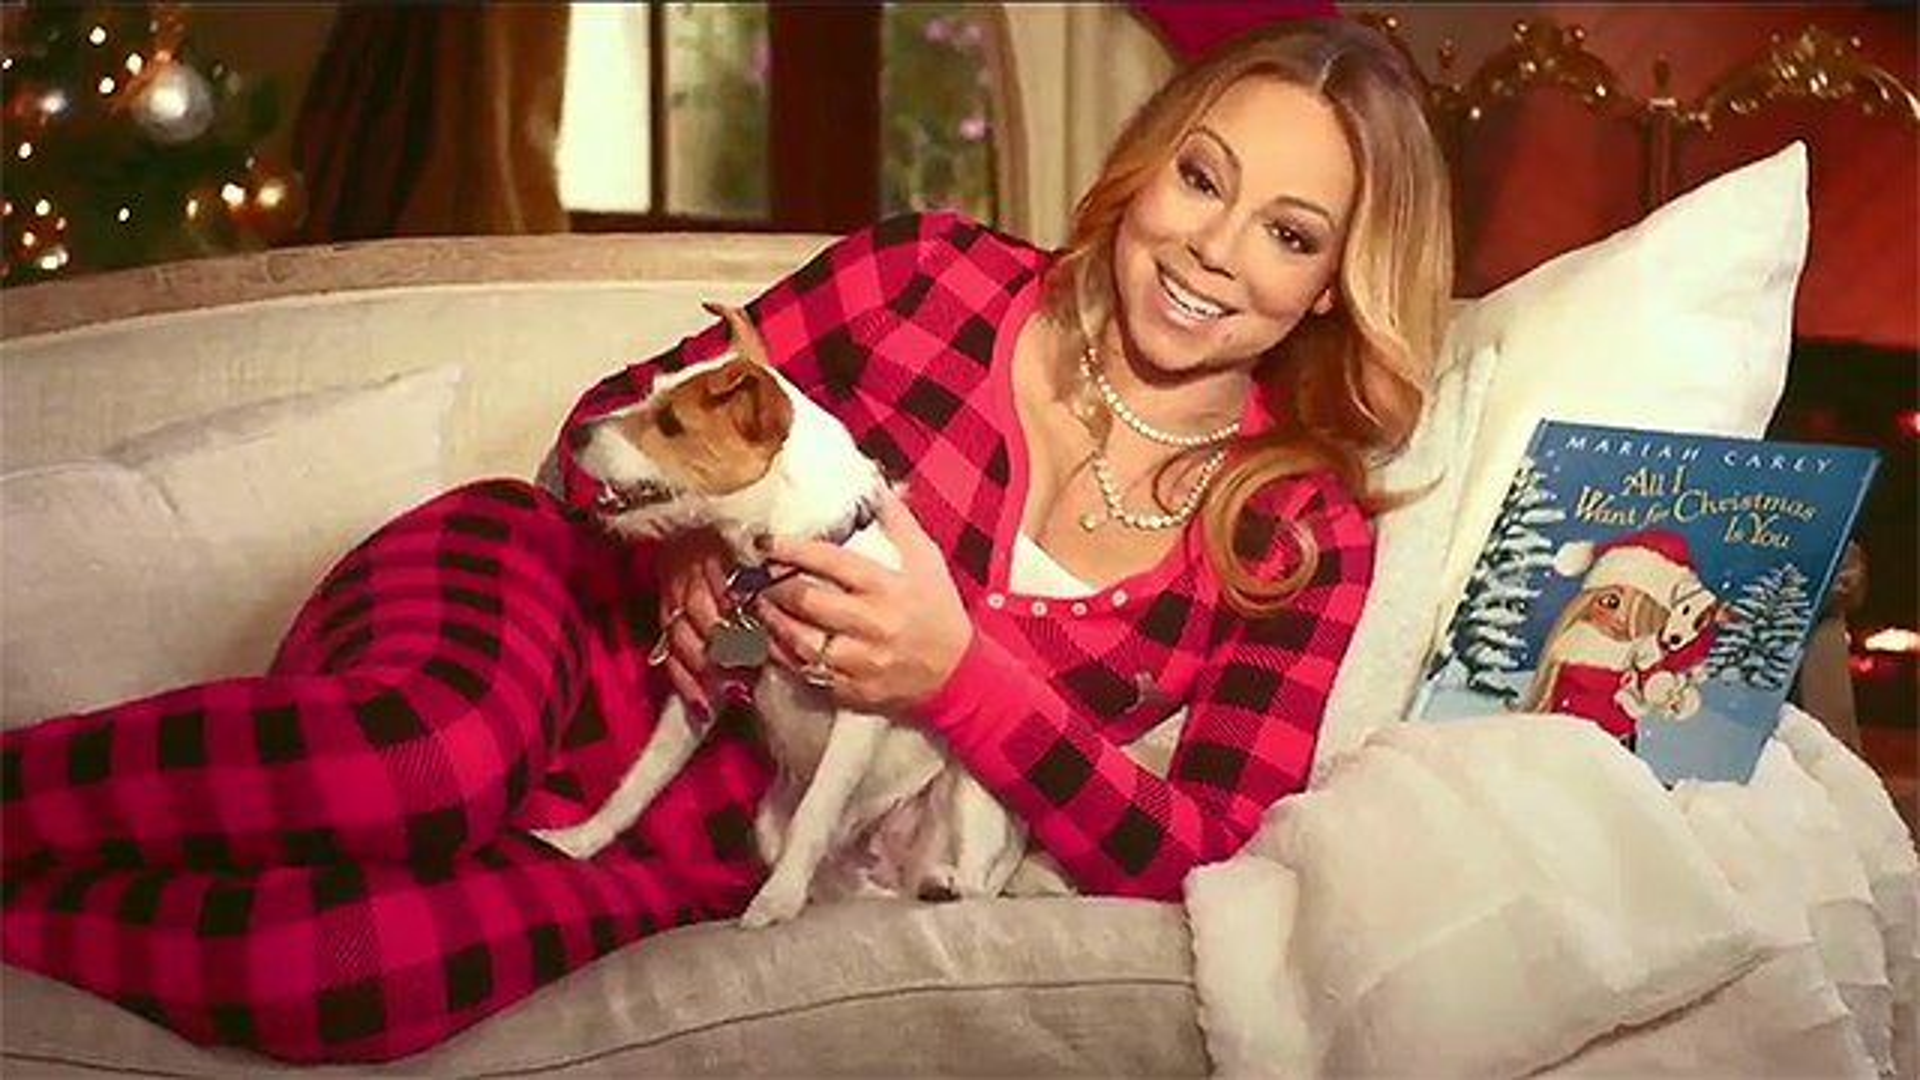 Mariah-Carey-All-I-Want-For-Christmas-Film-Teaser